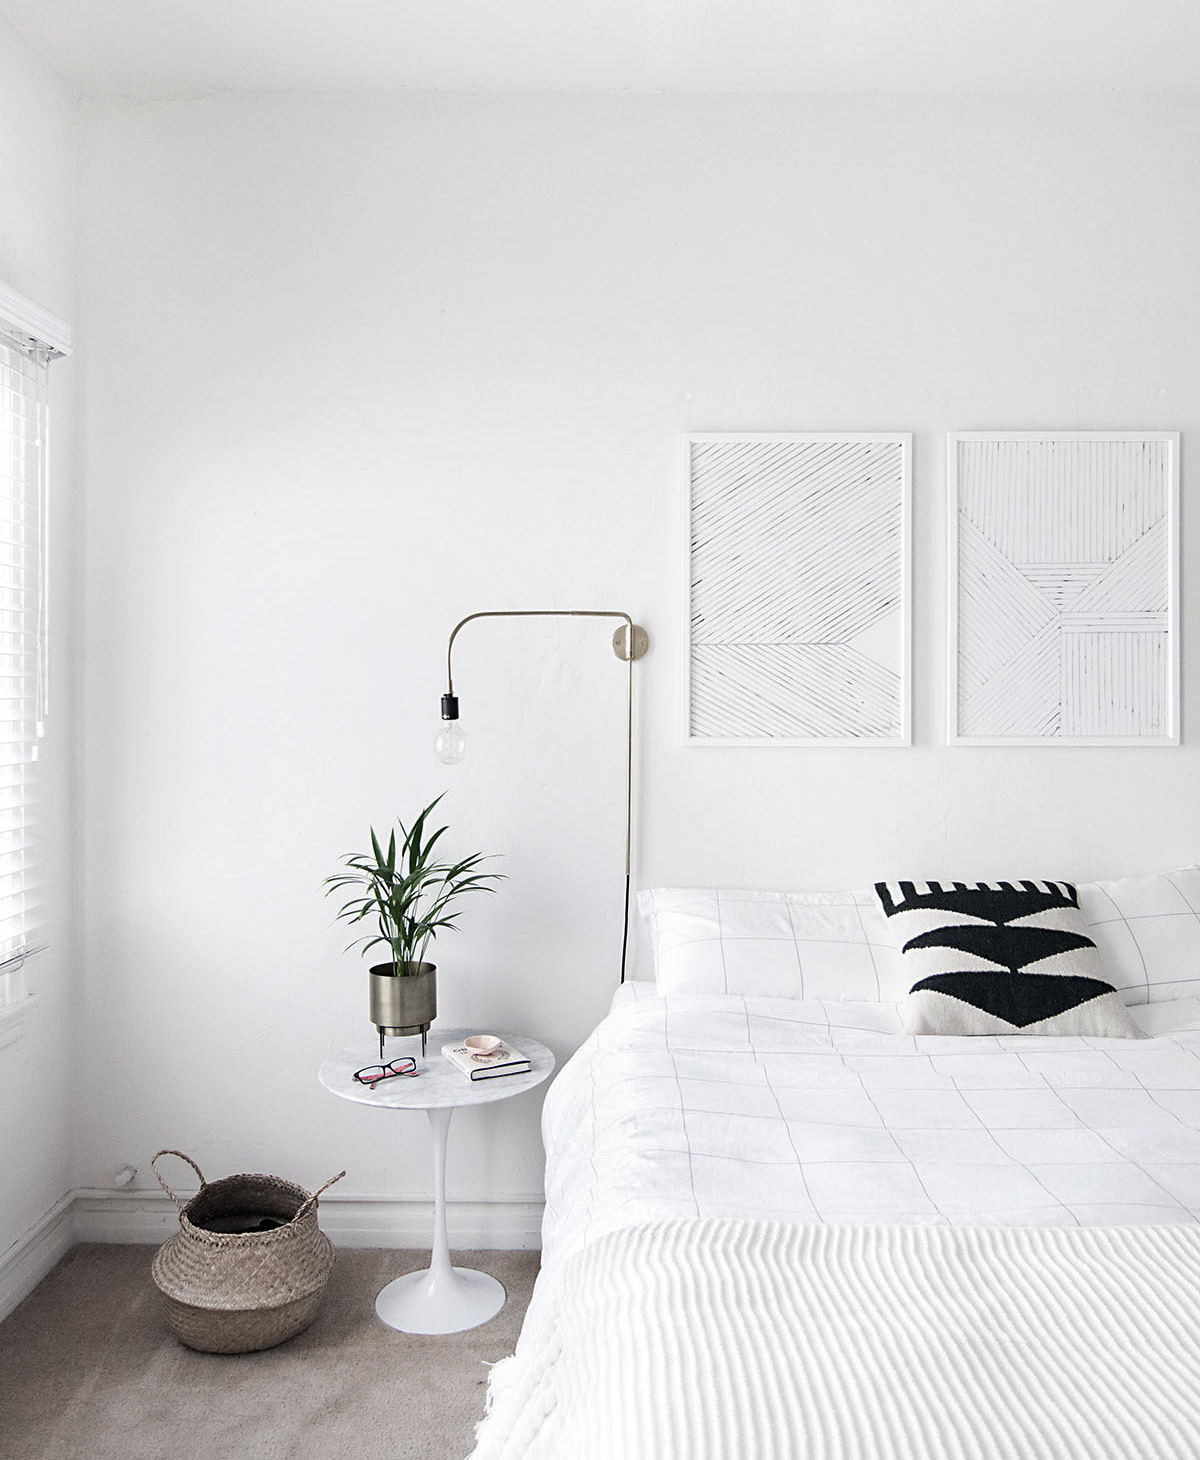 How to Achieve a Minimal Scandinavian Bedroom - Homey Oh My on Bedroom Minimalist Ideas  id=43872